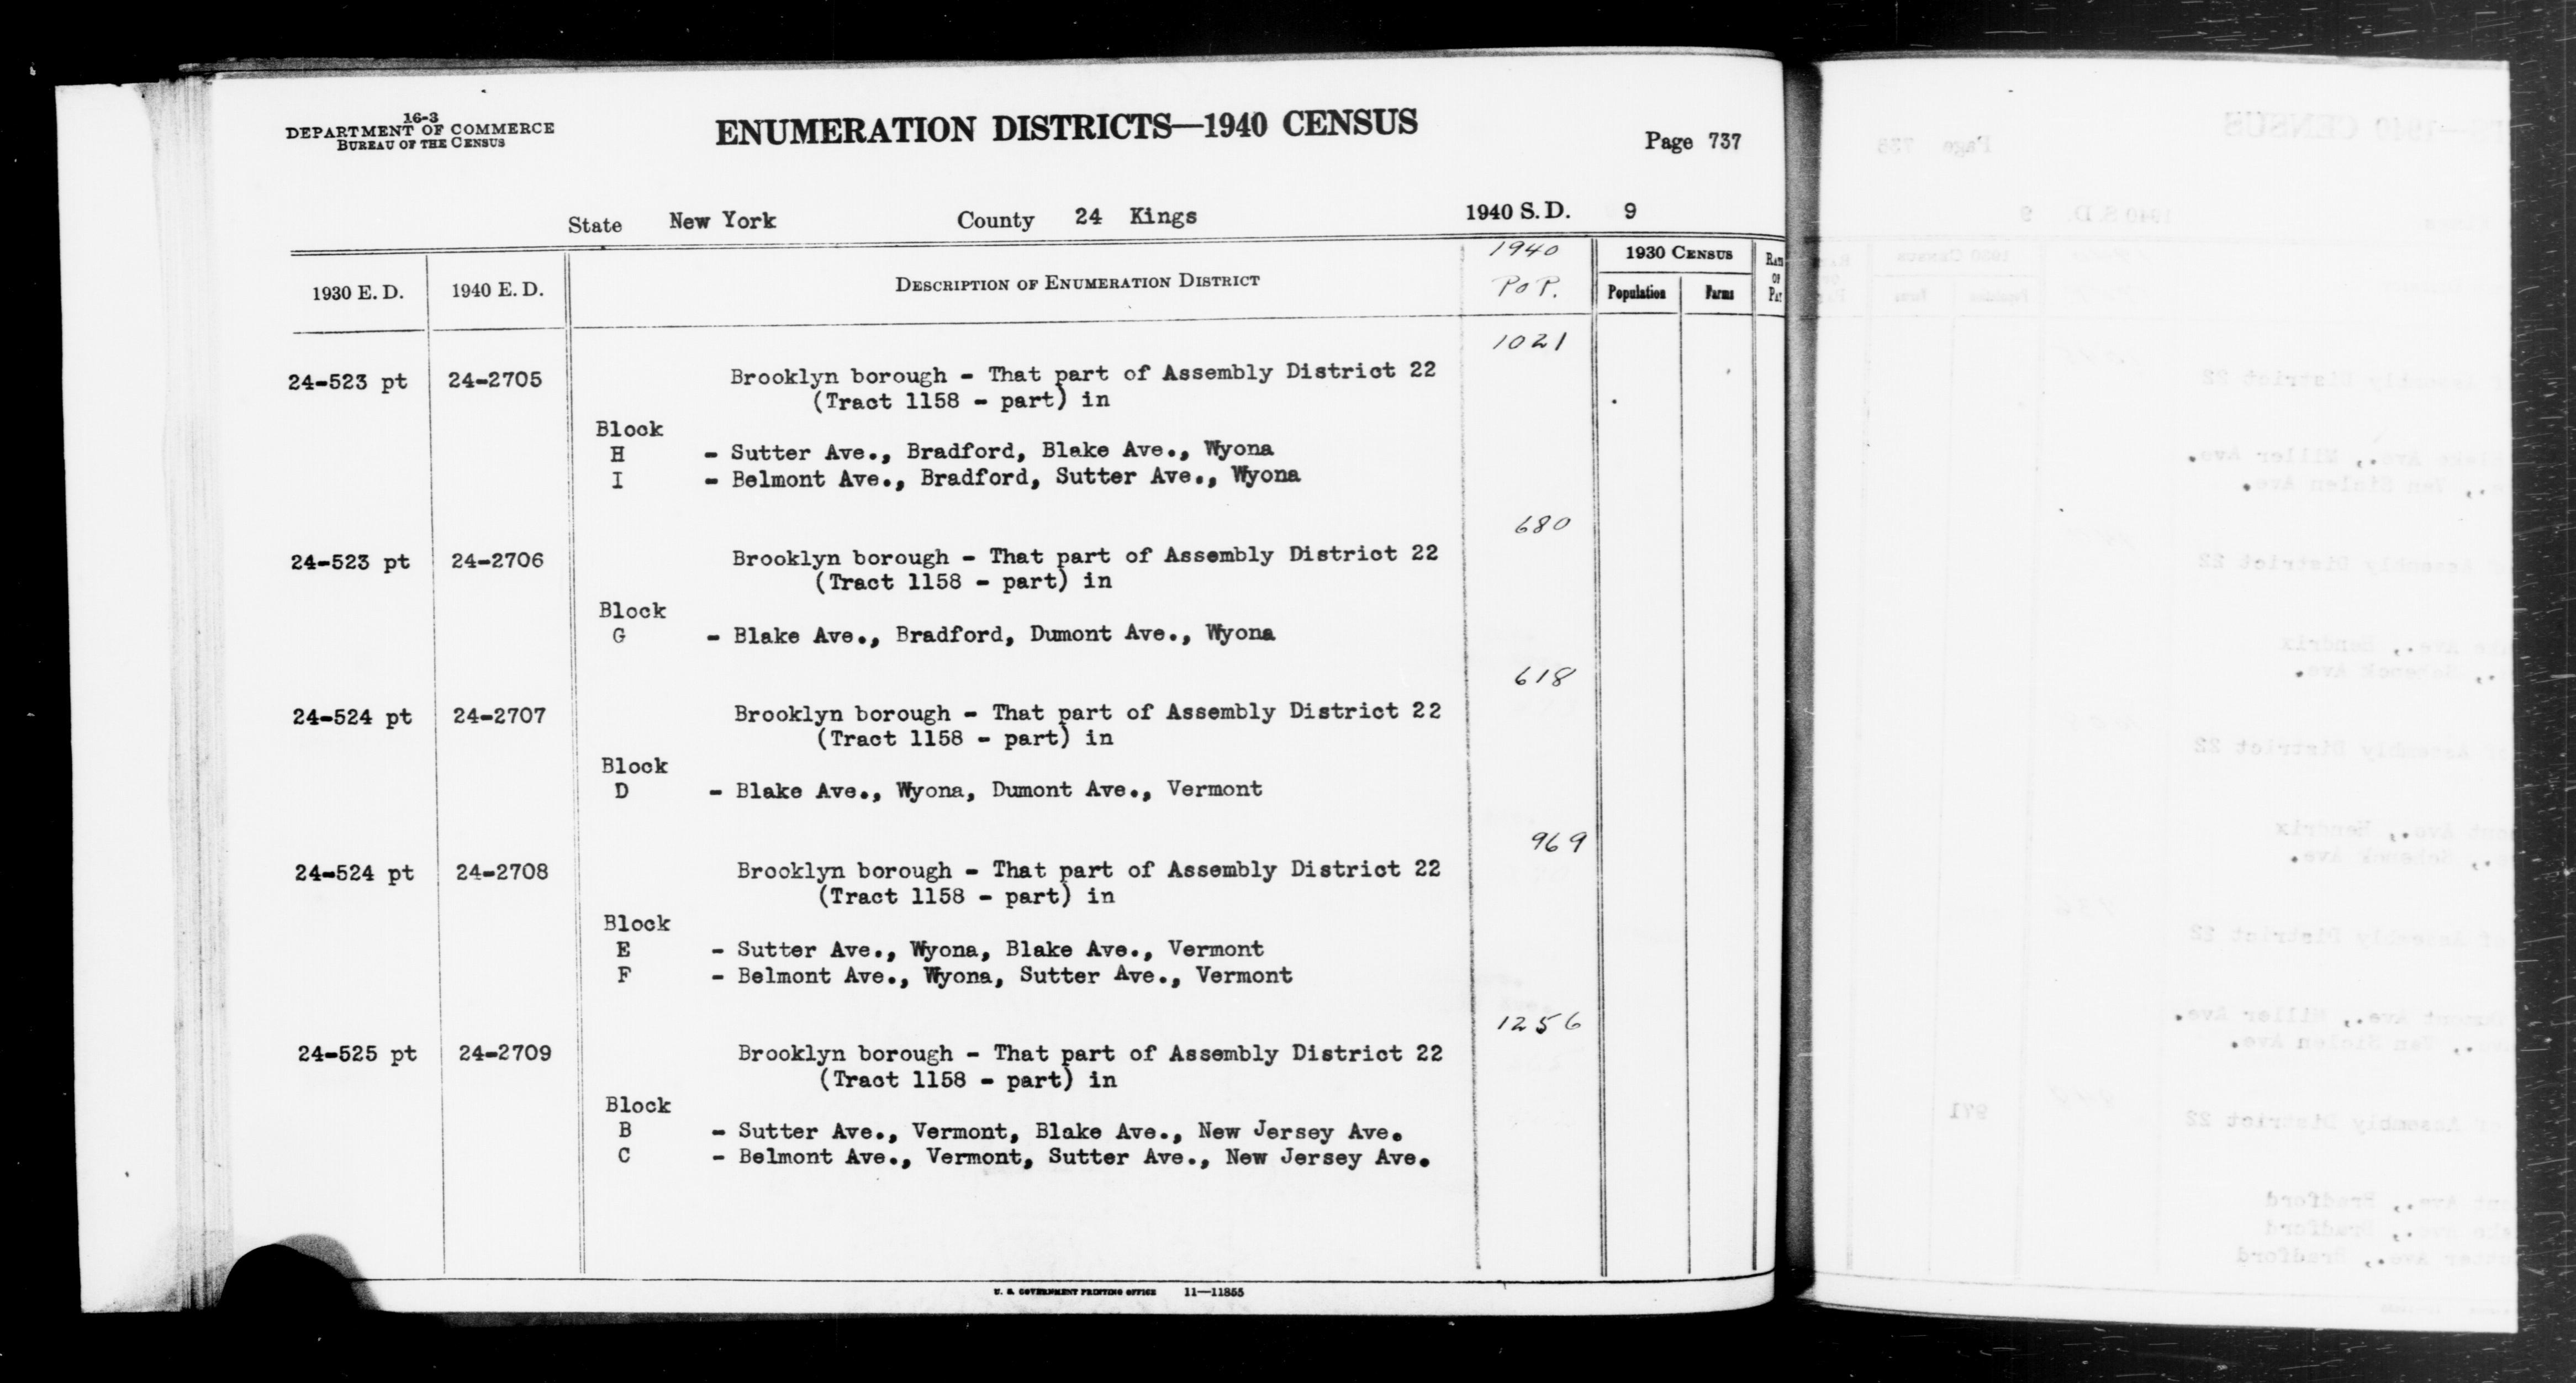 1940 Census Enumeration District Descriptions - New York - Kings County - ED 24-2705, ED 24-2706, ED 24-2707, ED 24-2708, ED 24-2709